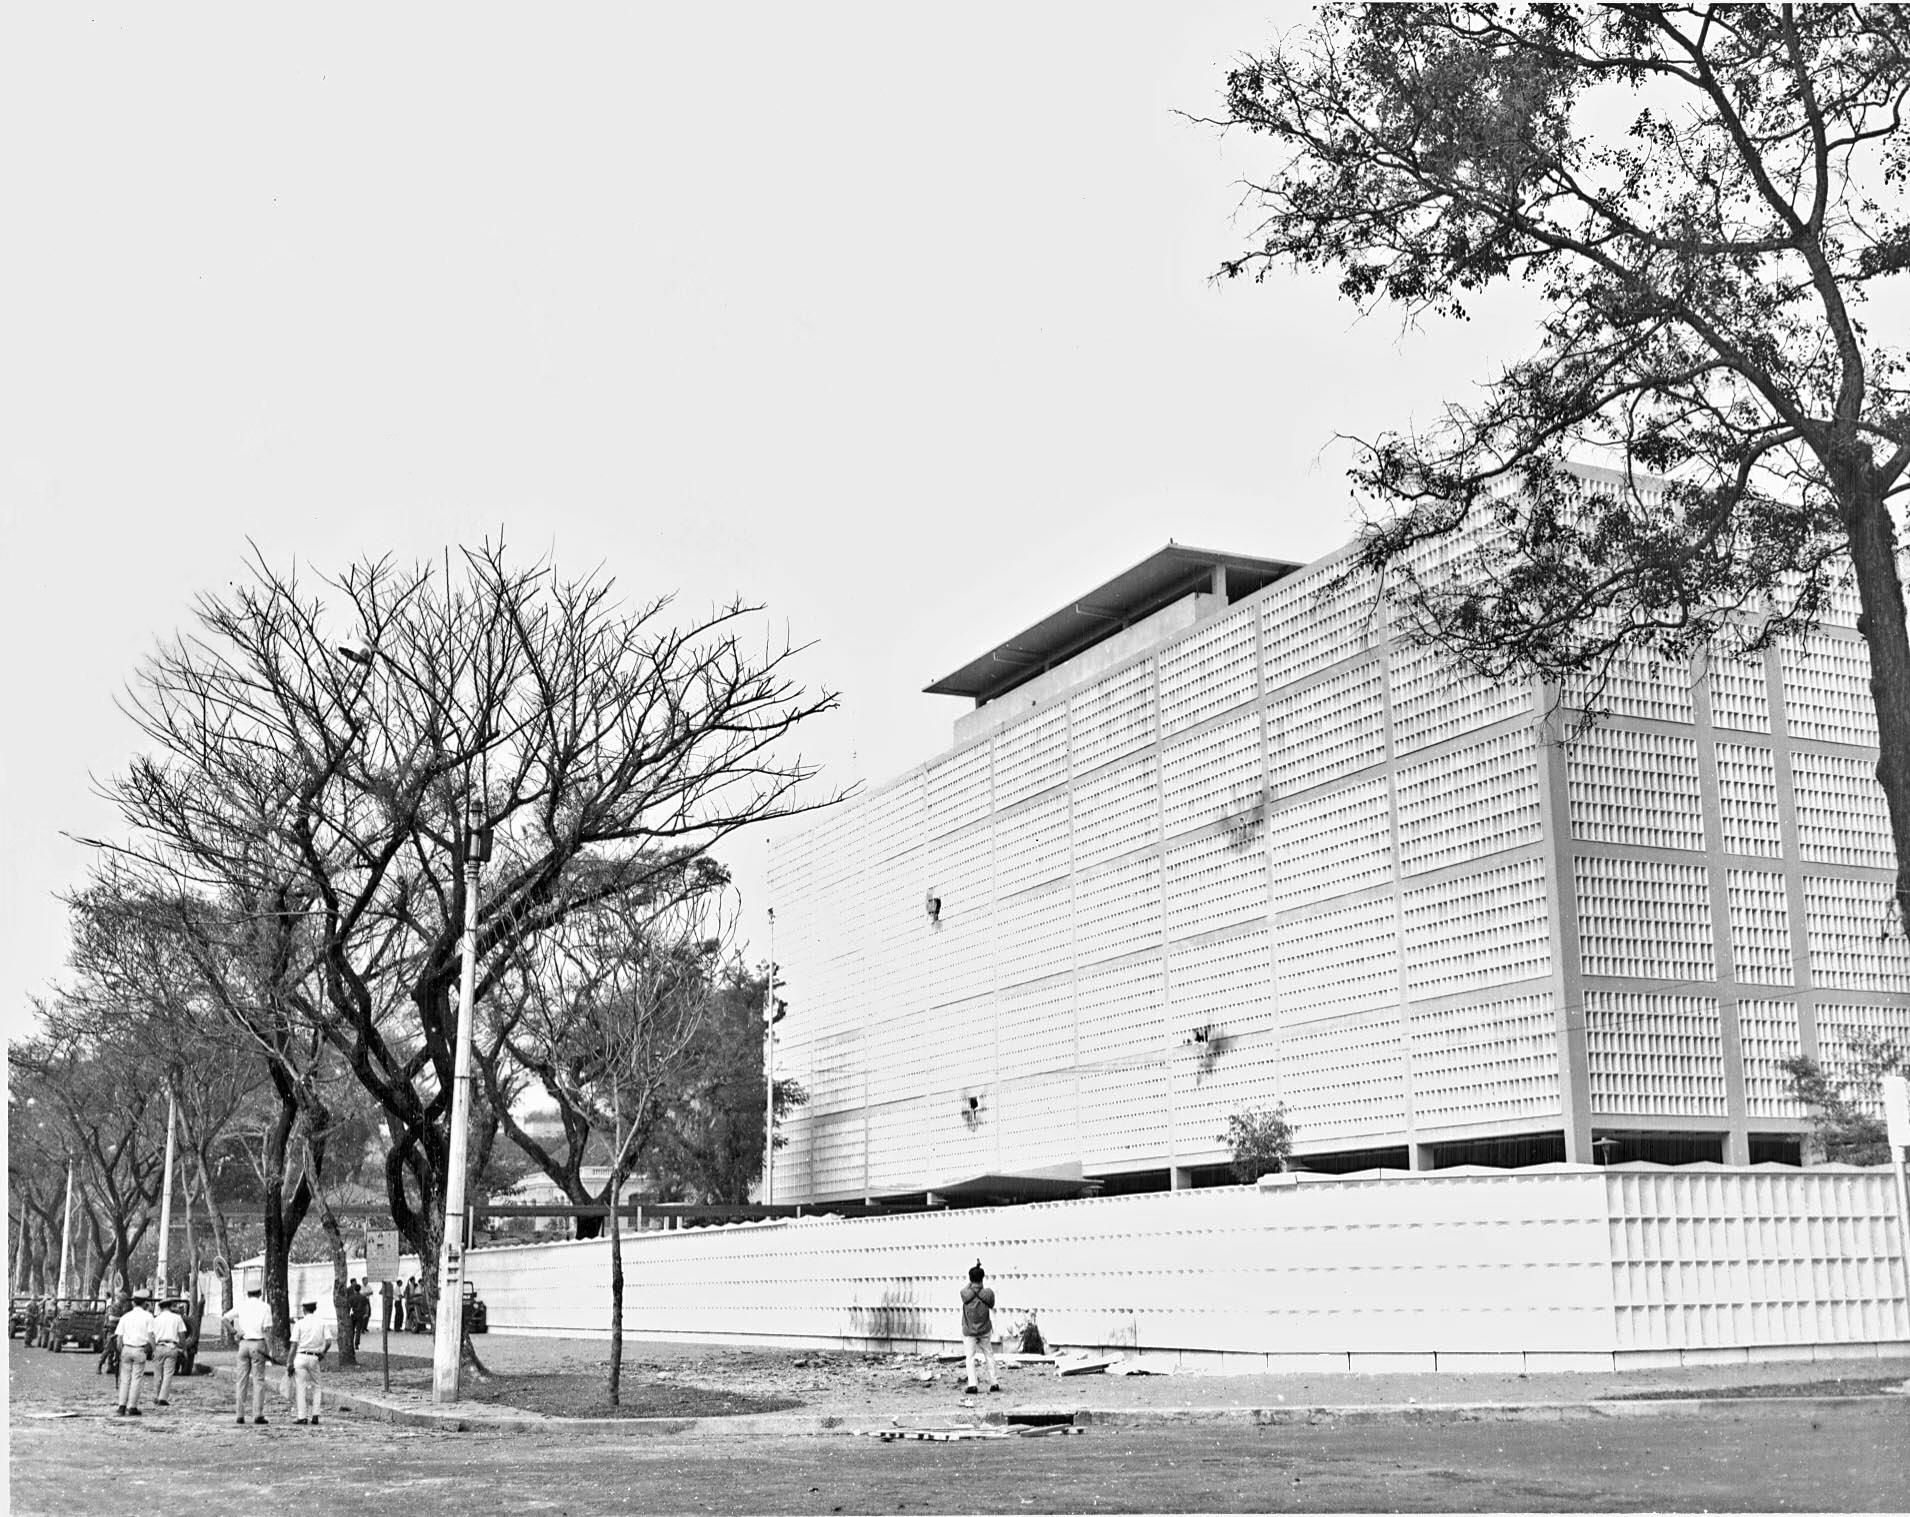 Embassy of the United States, Saigon - Wikipedia